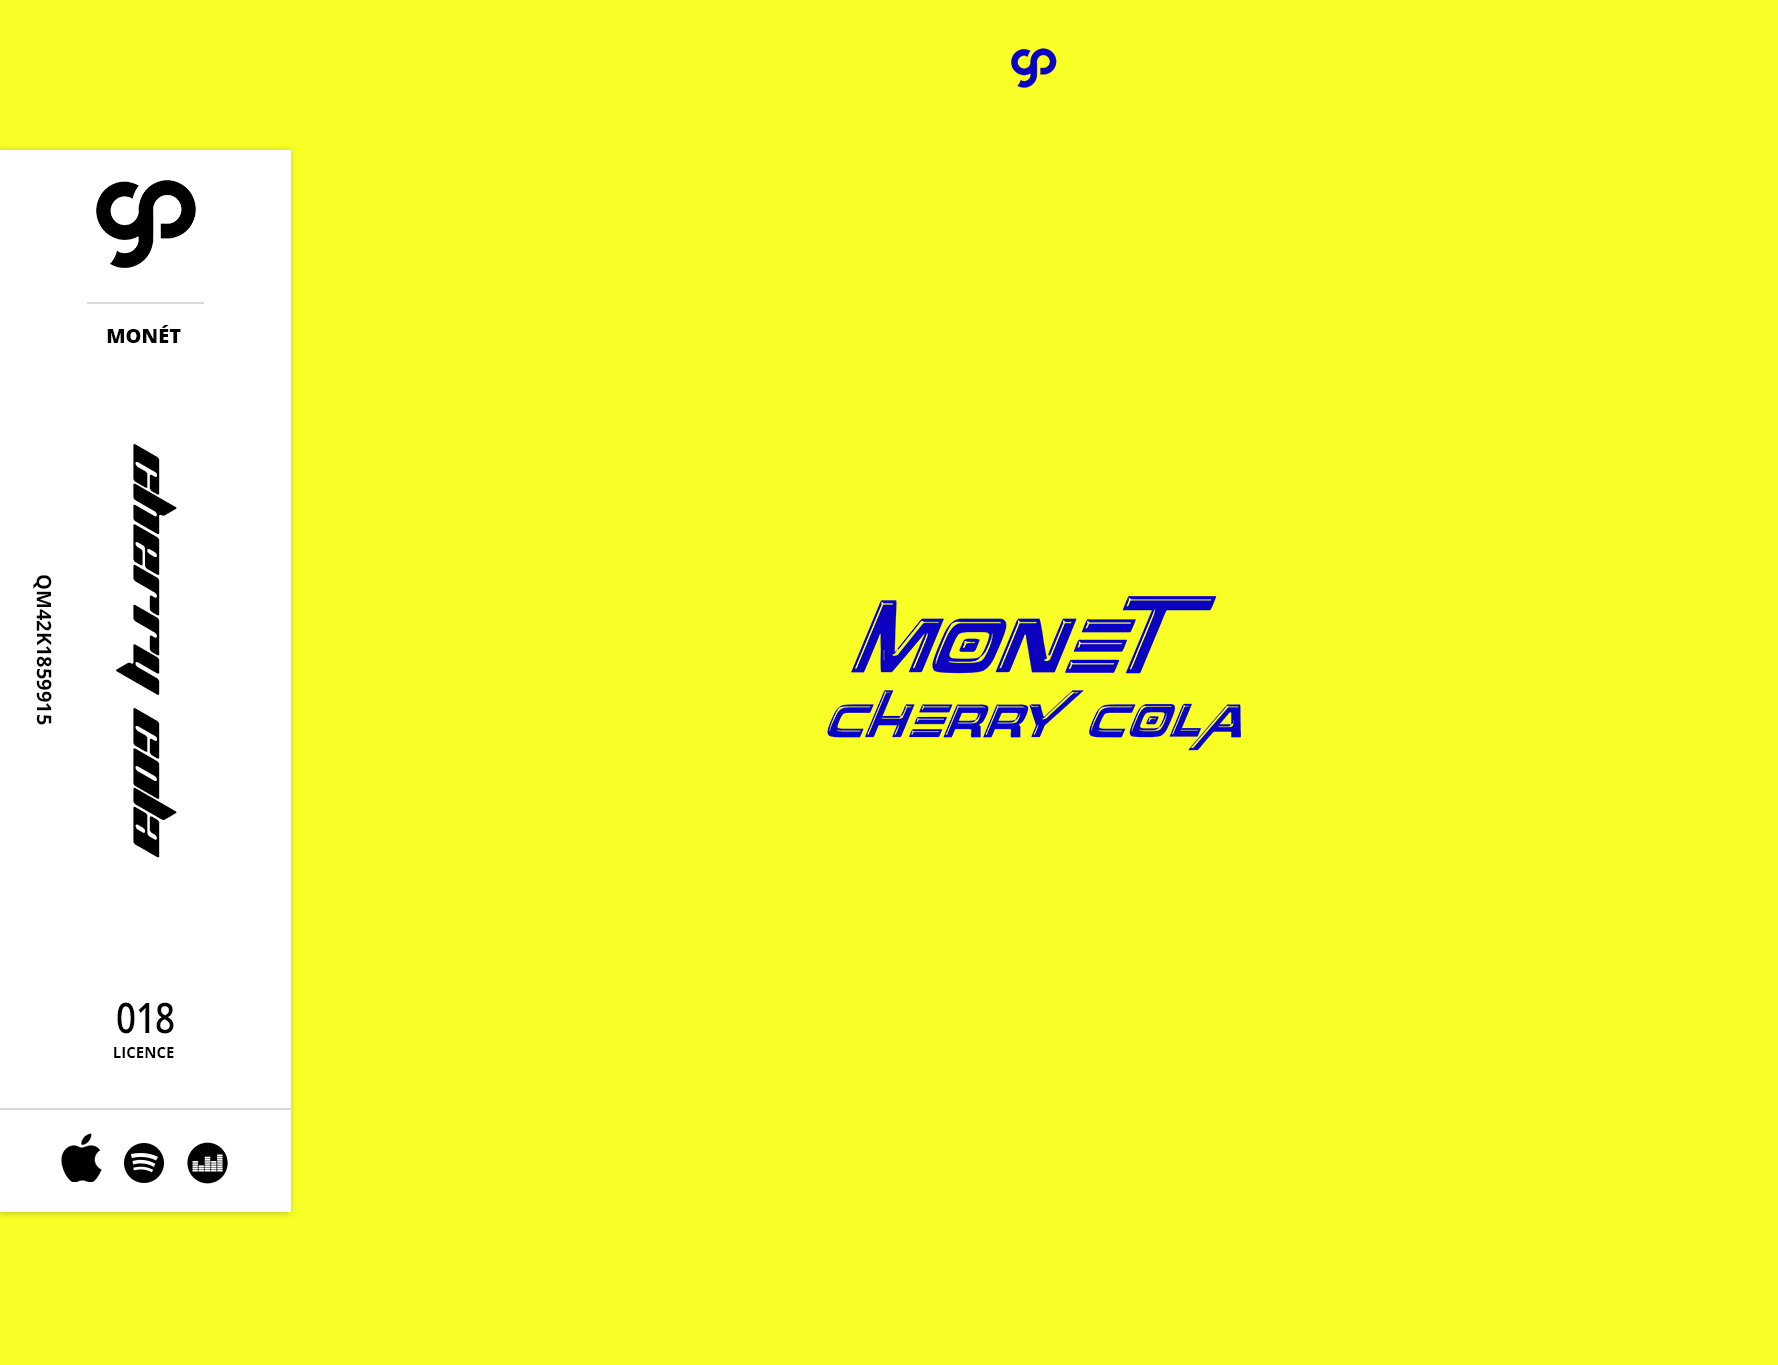 Monét - Cherry Cola.jpg